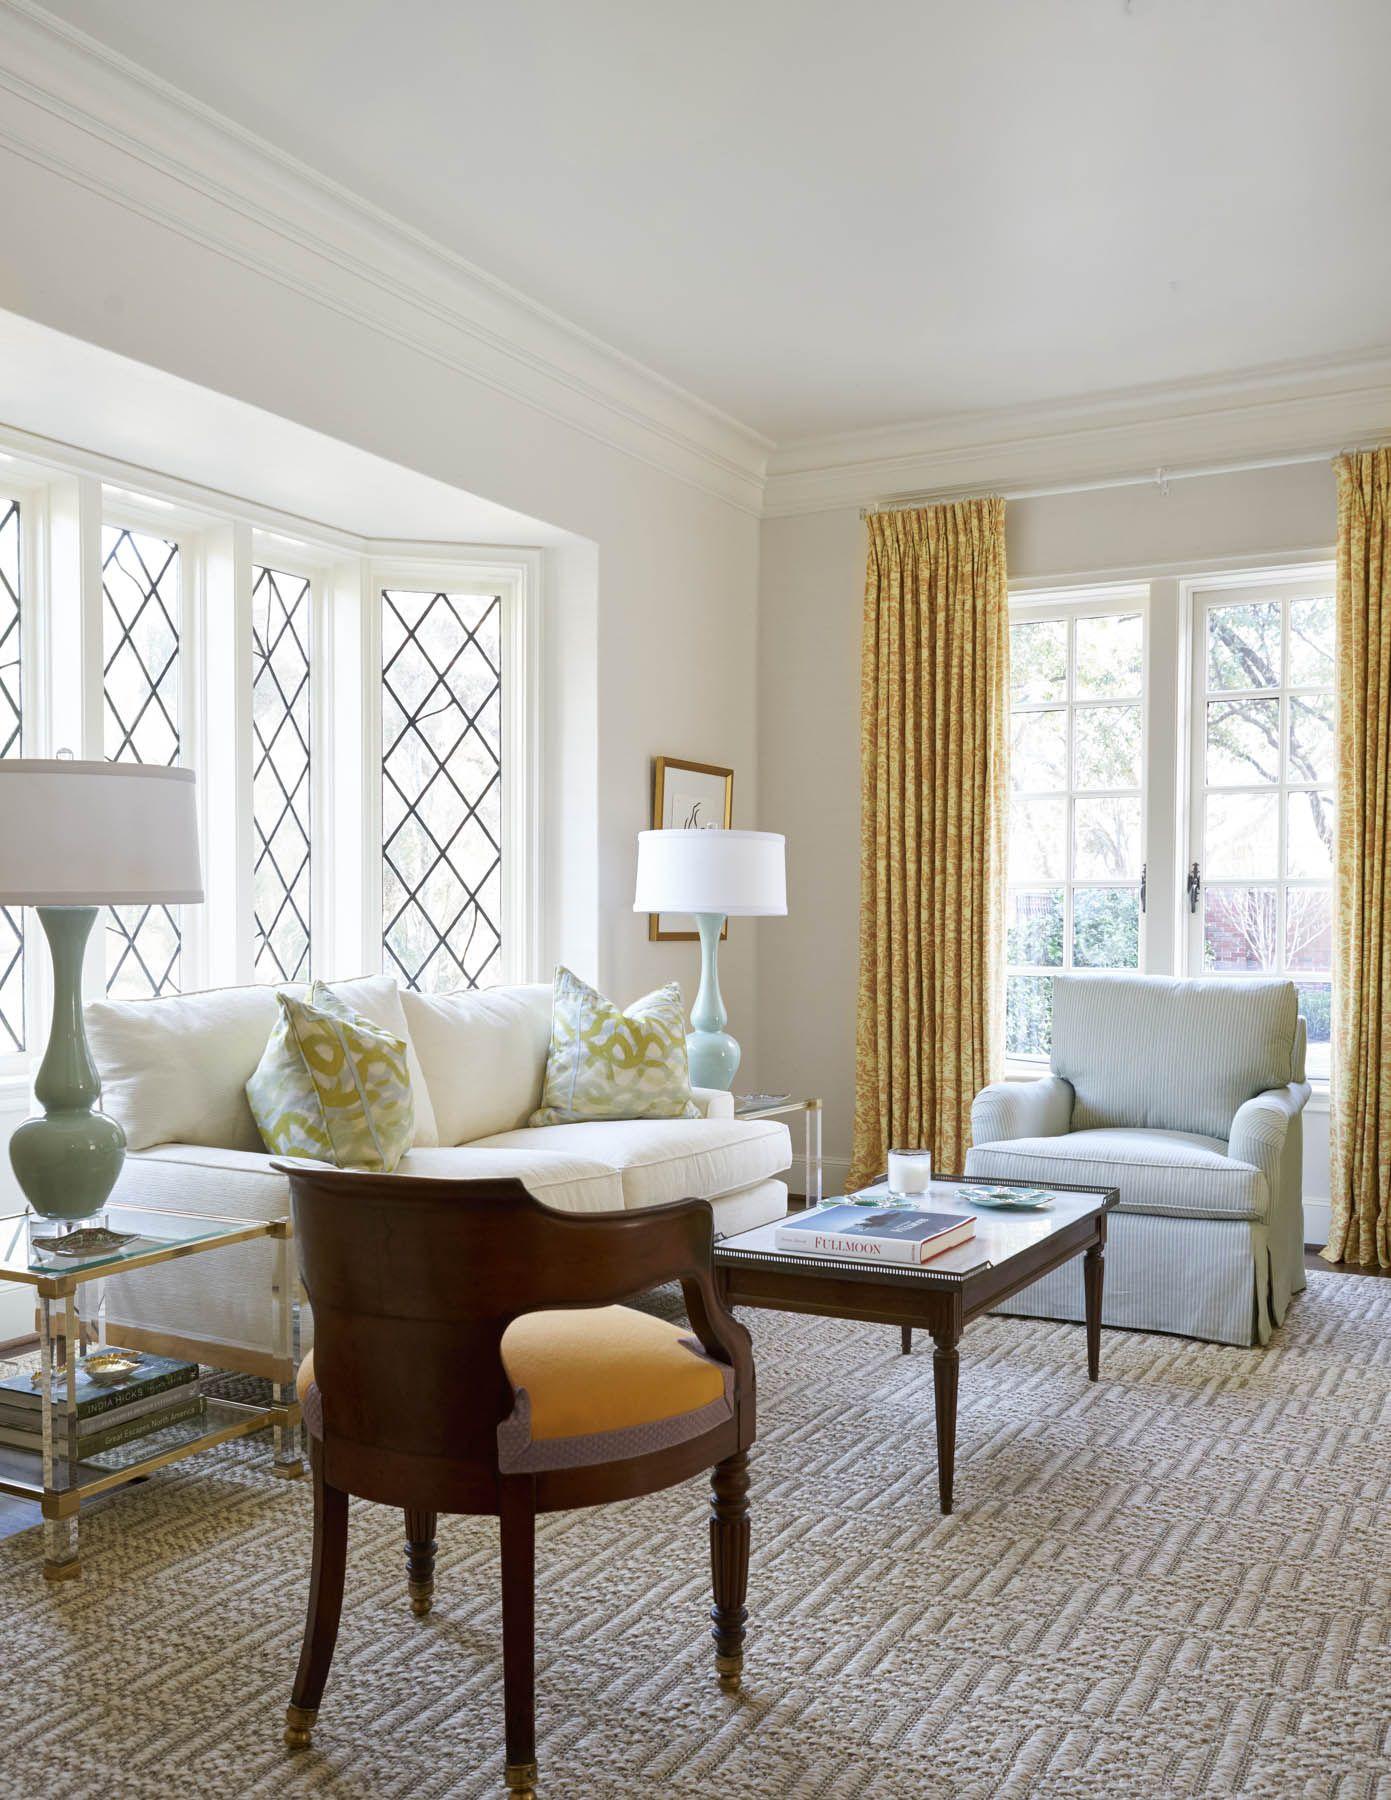 Living room ideas palette vibe That